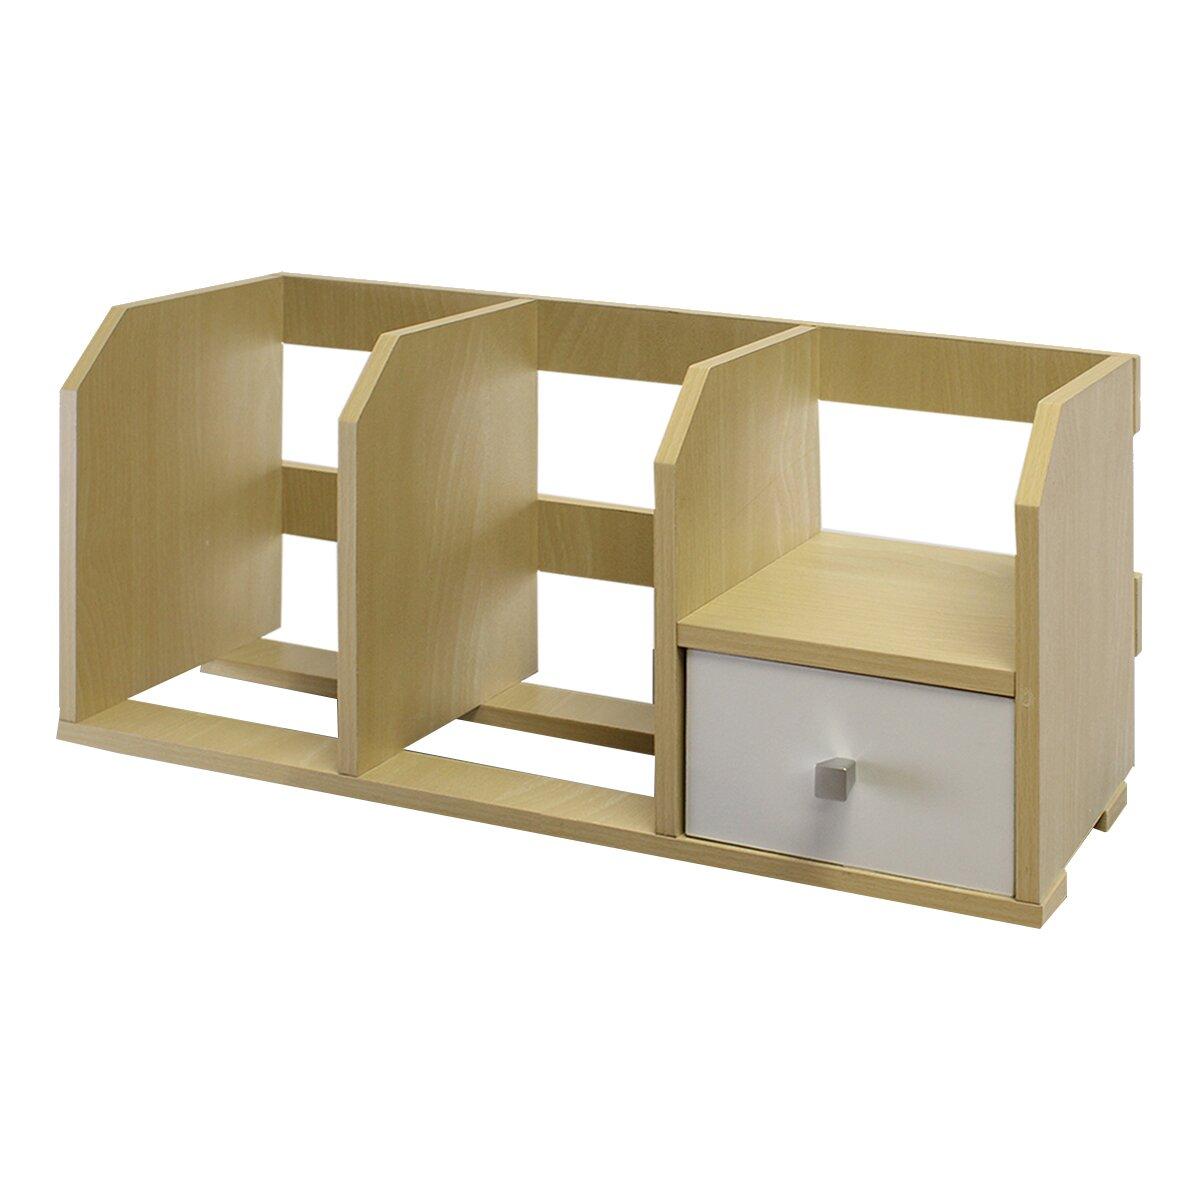 Furinno pasir desk storage shelf with bin reviews wayfair - Desk shelf organizer ...